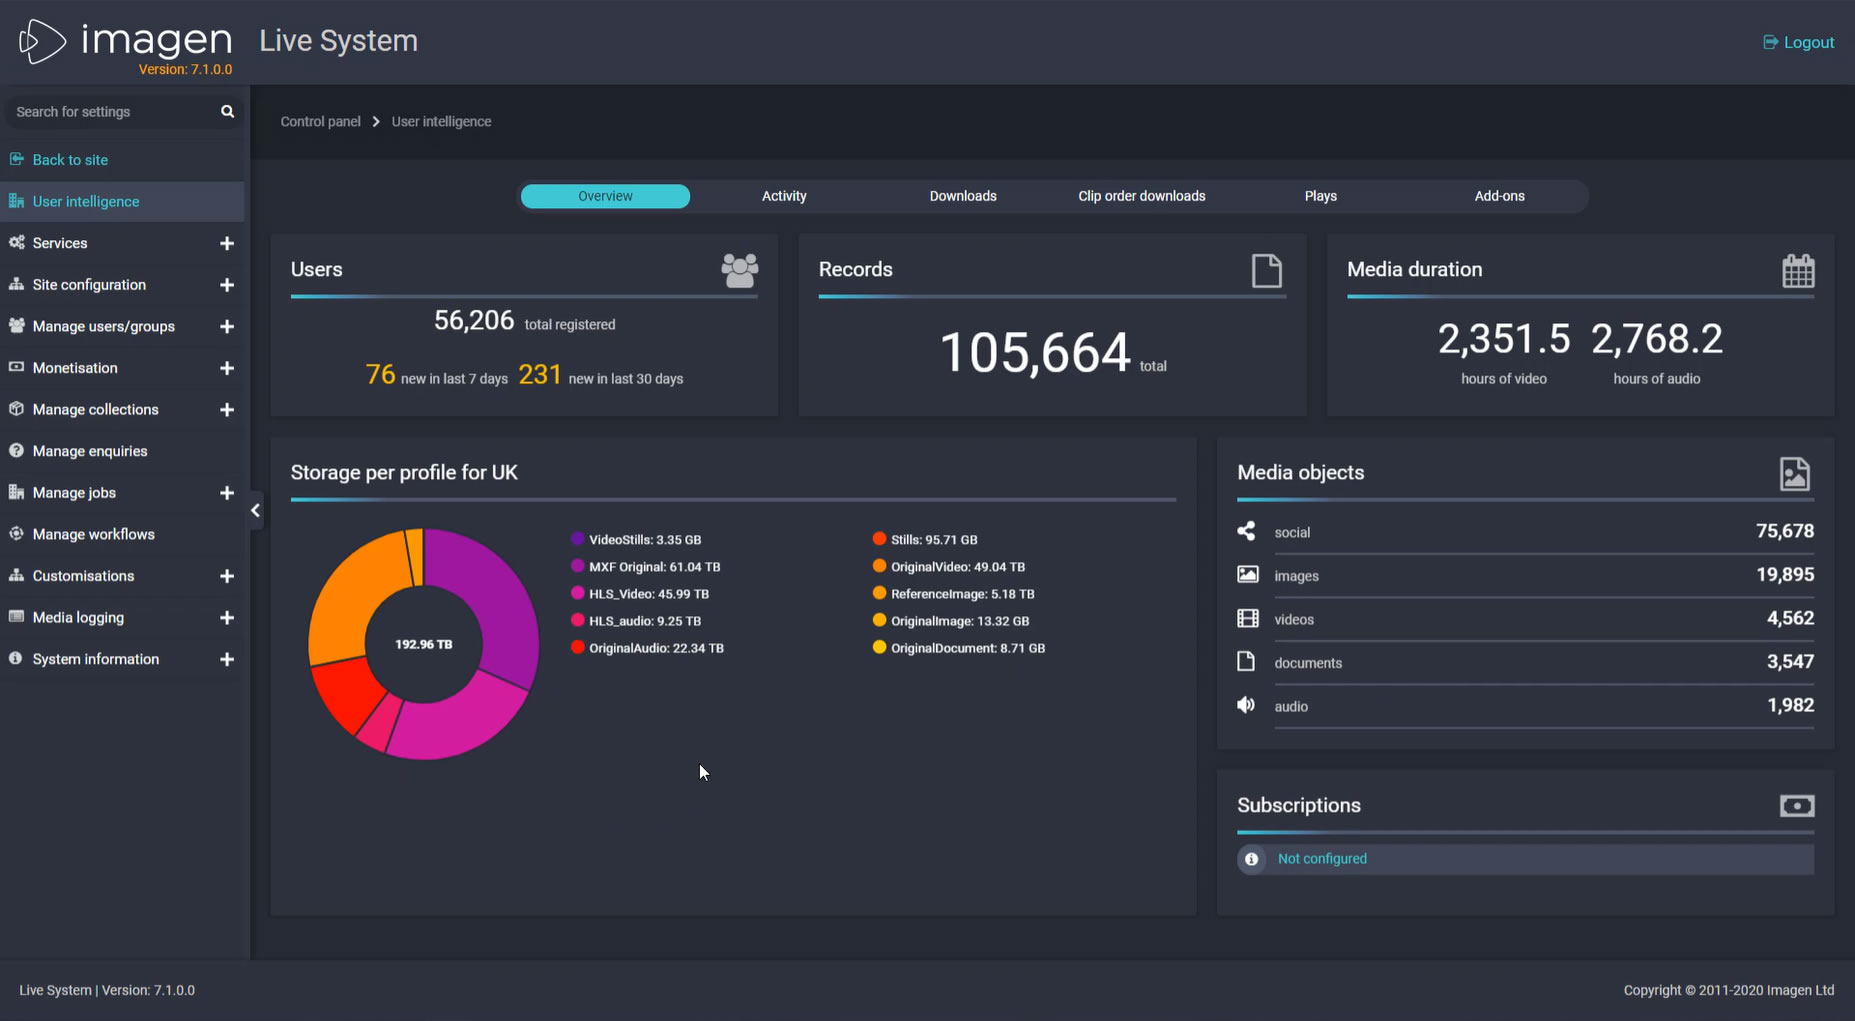 Imagen's updated management interface